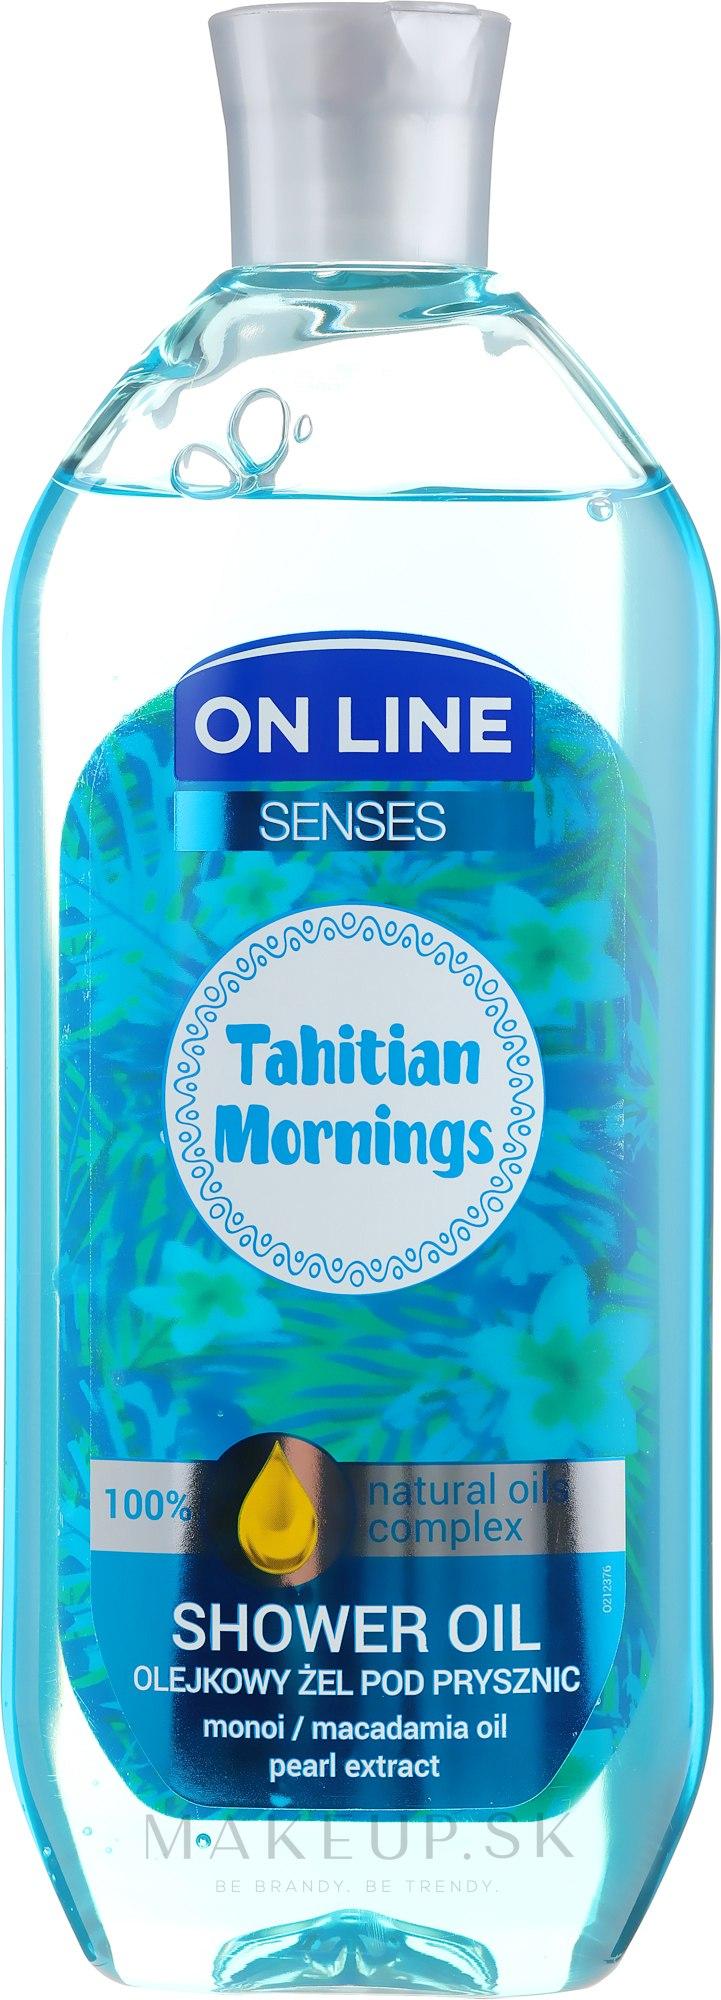 Sprchový olej - On Line Senses Shower Oil Tahitian Morning — Obrázky 500 ml